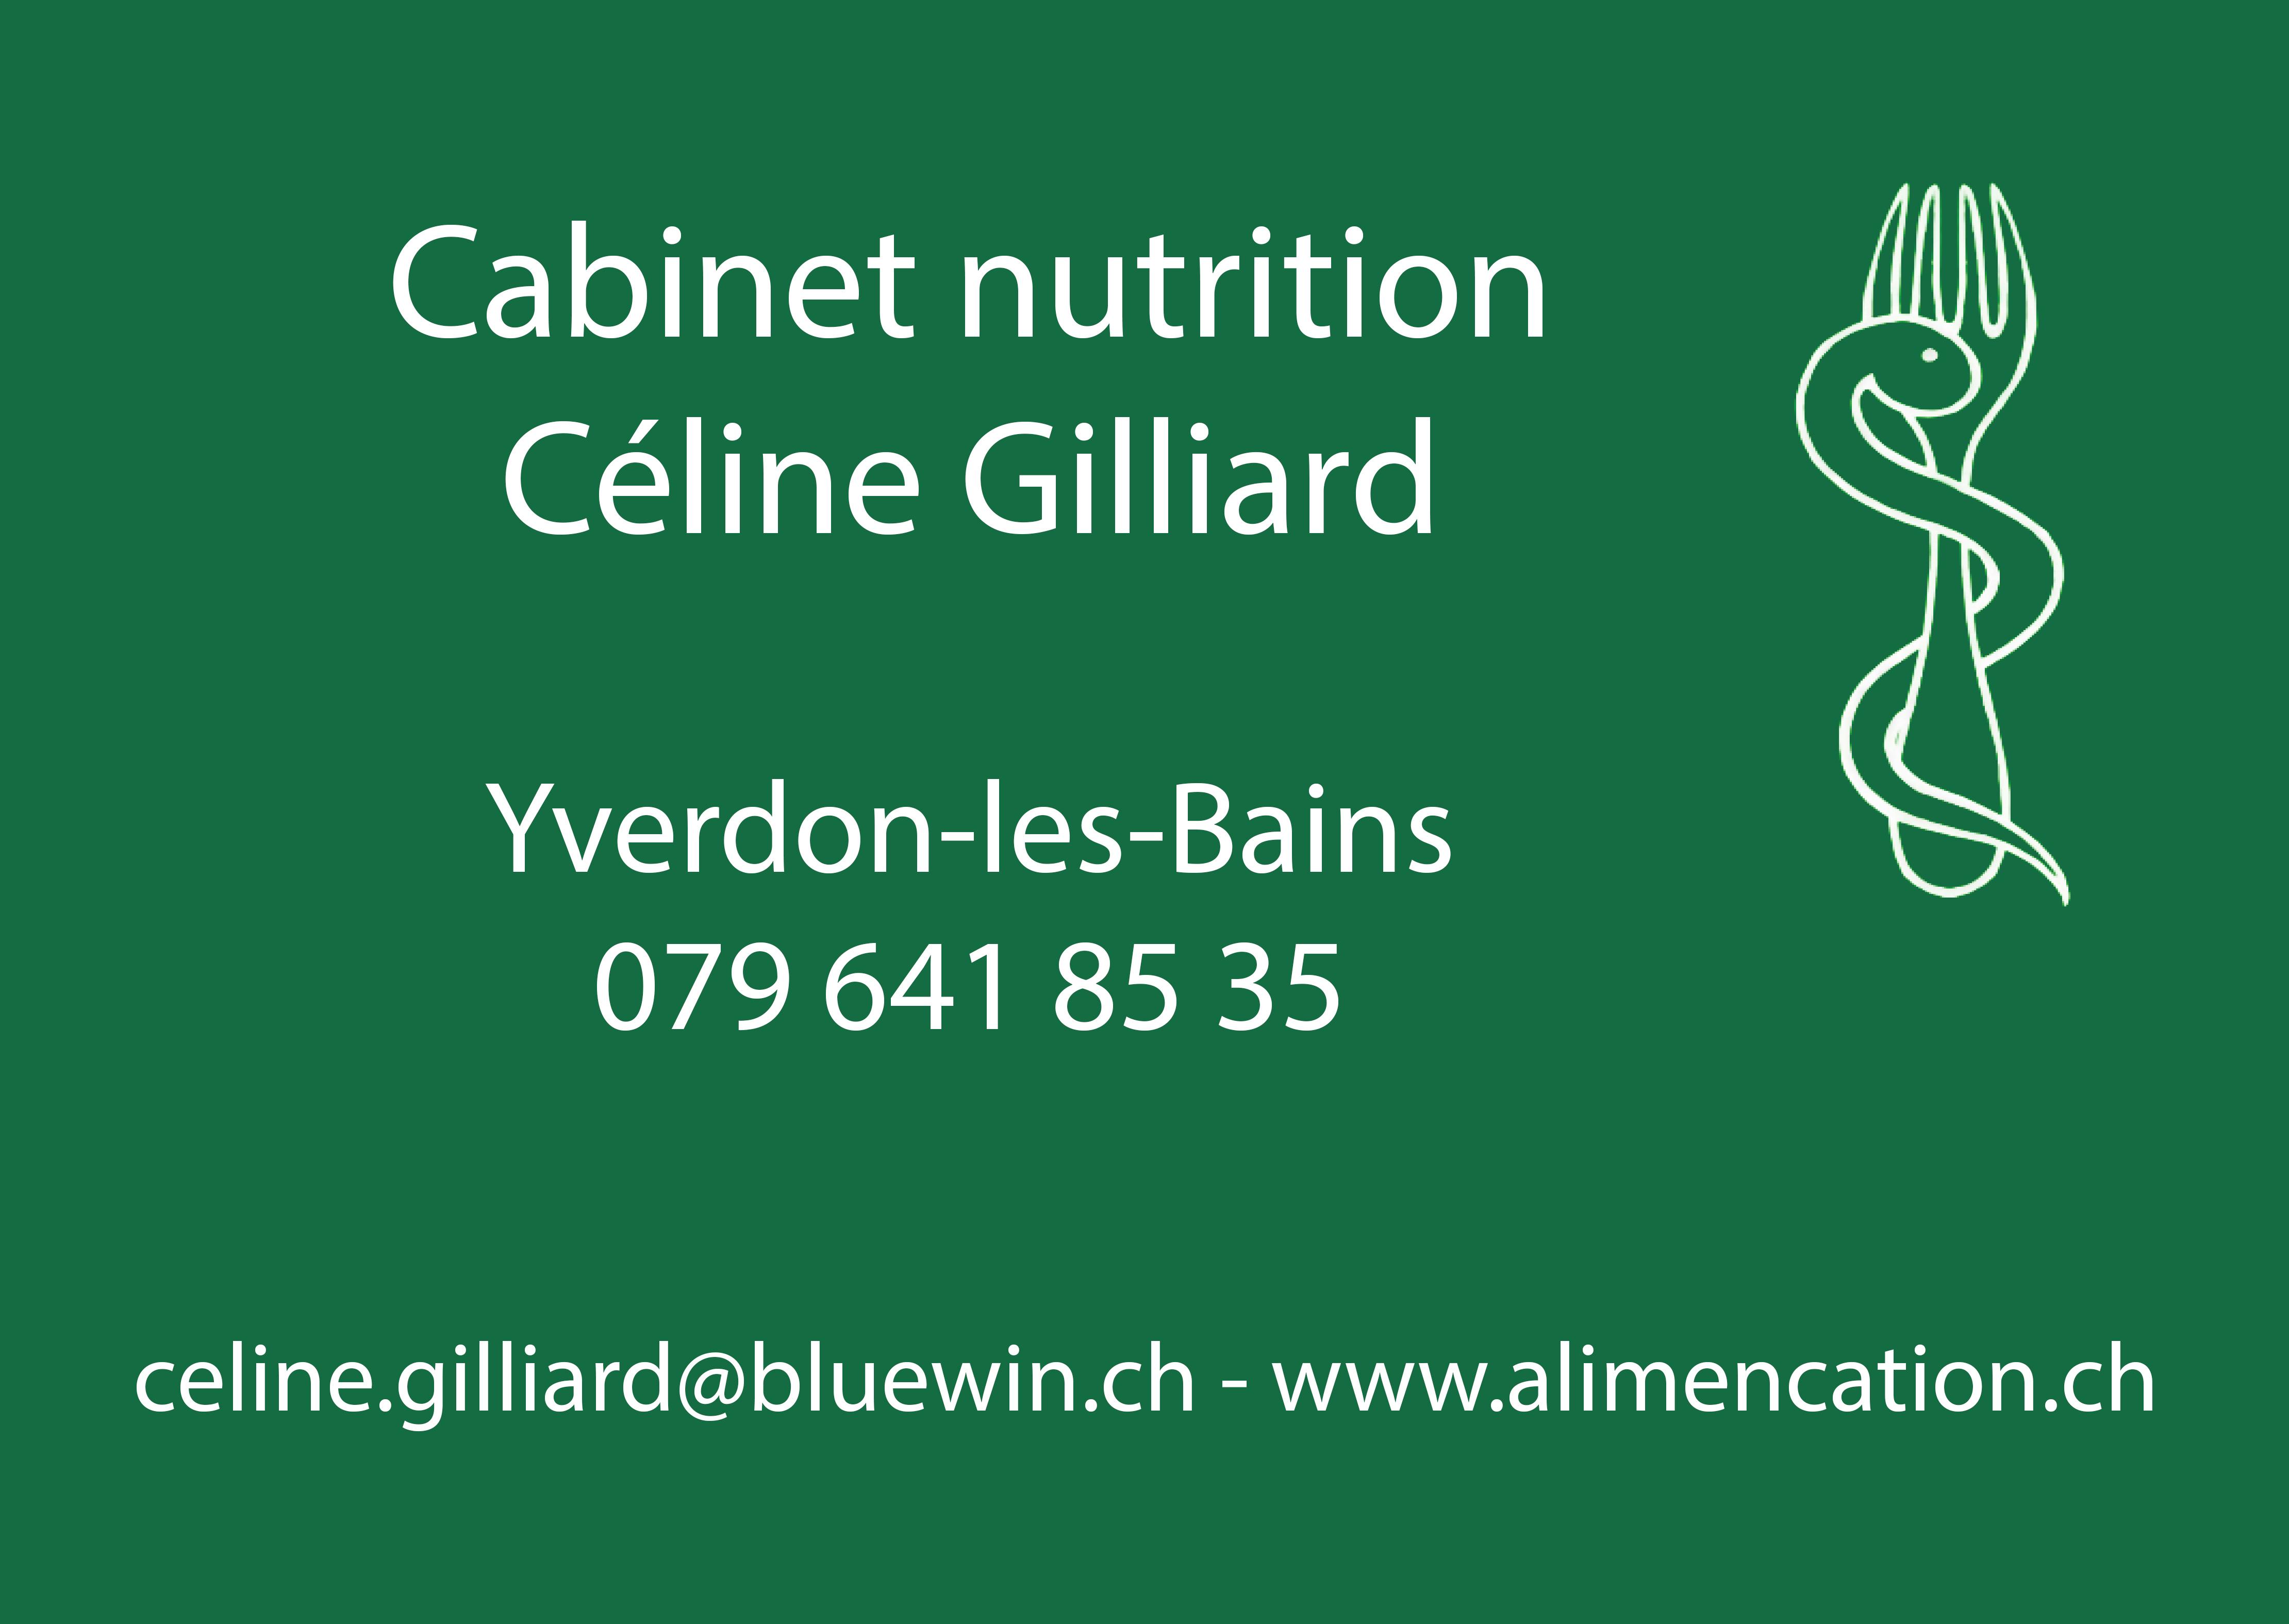 Cabinet Nutrition Gilliard